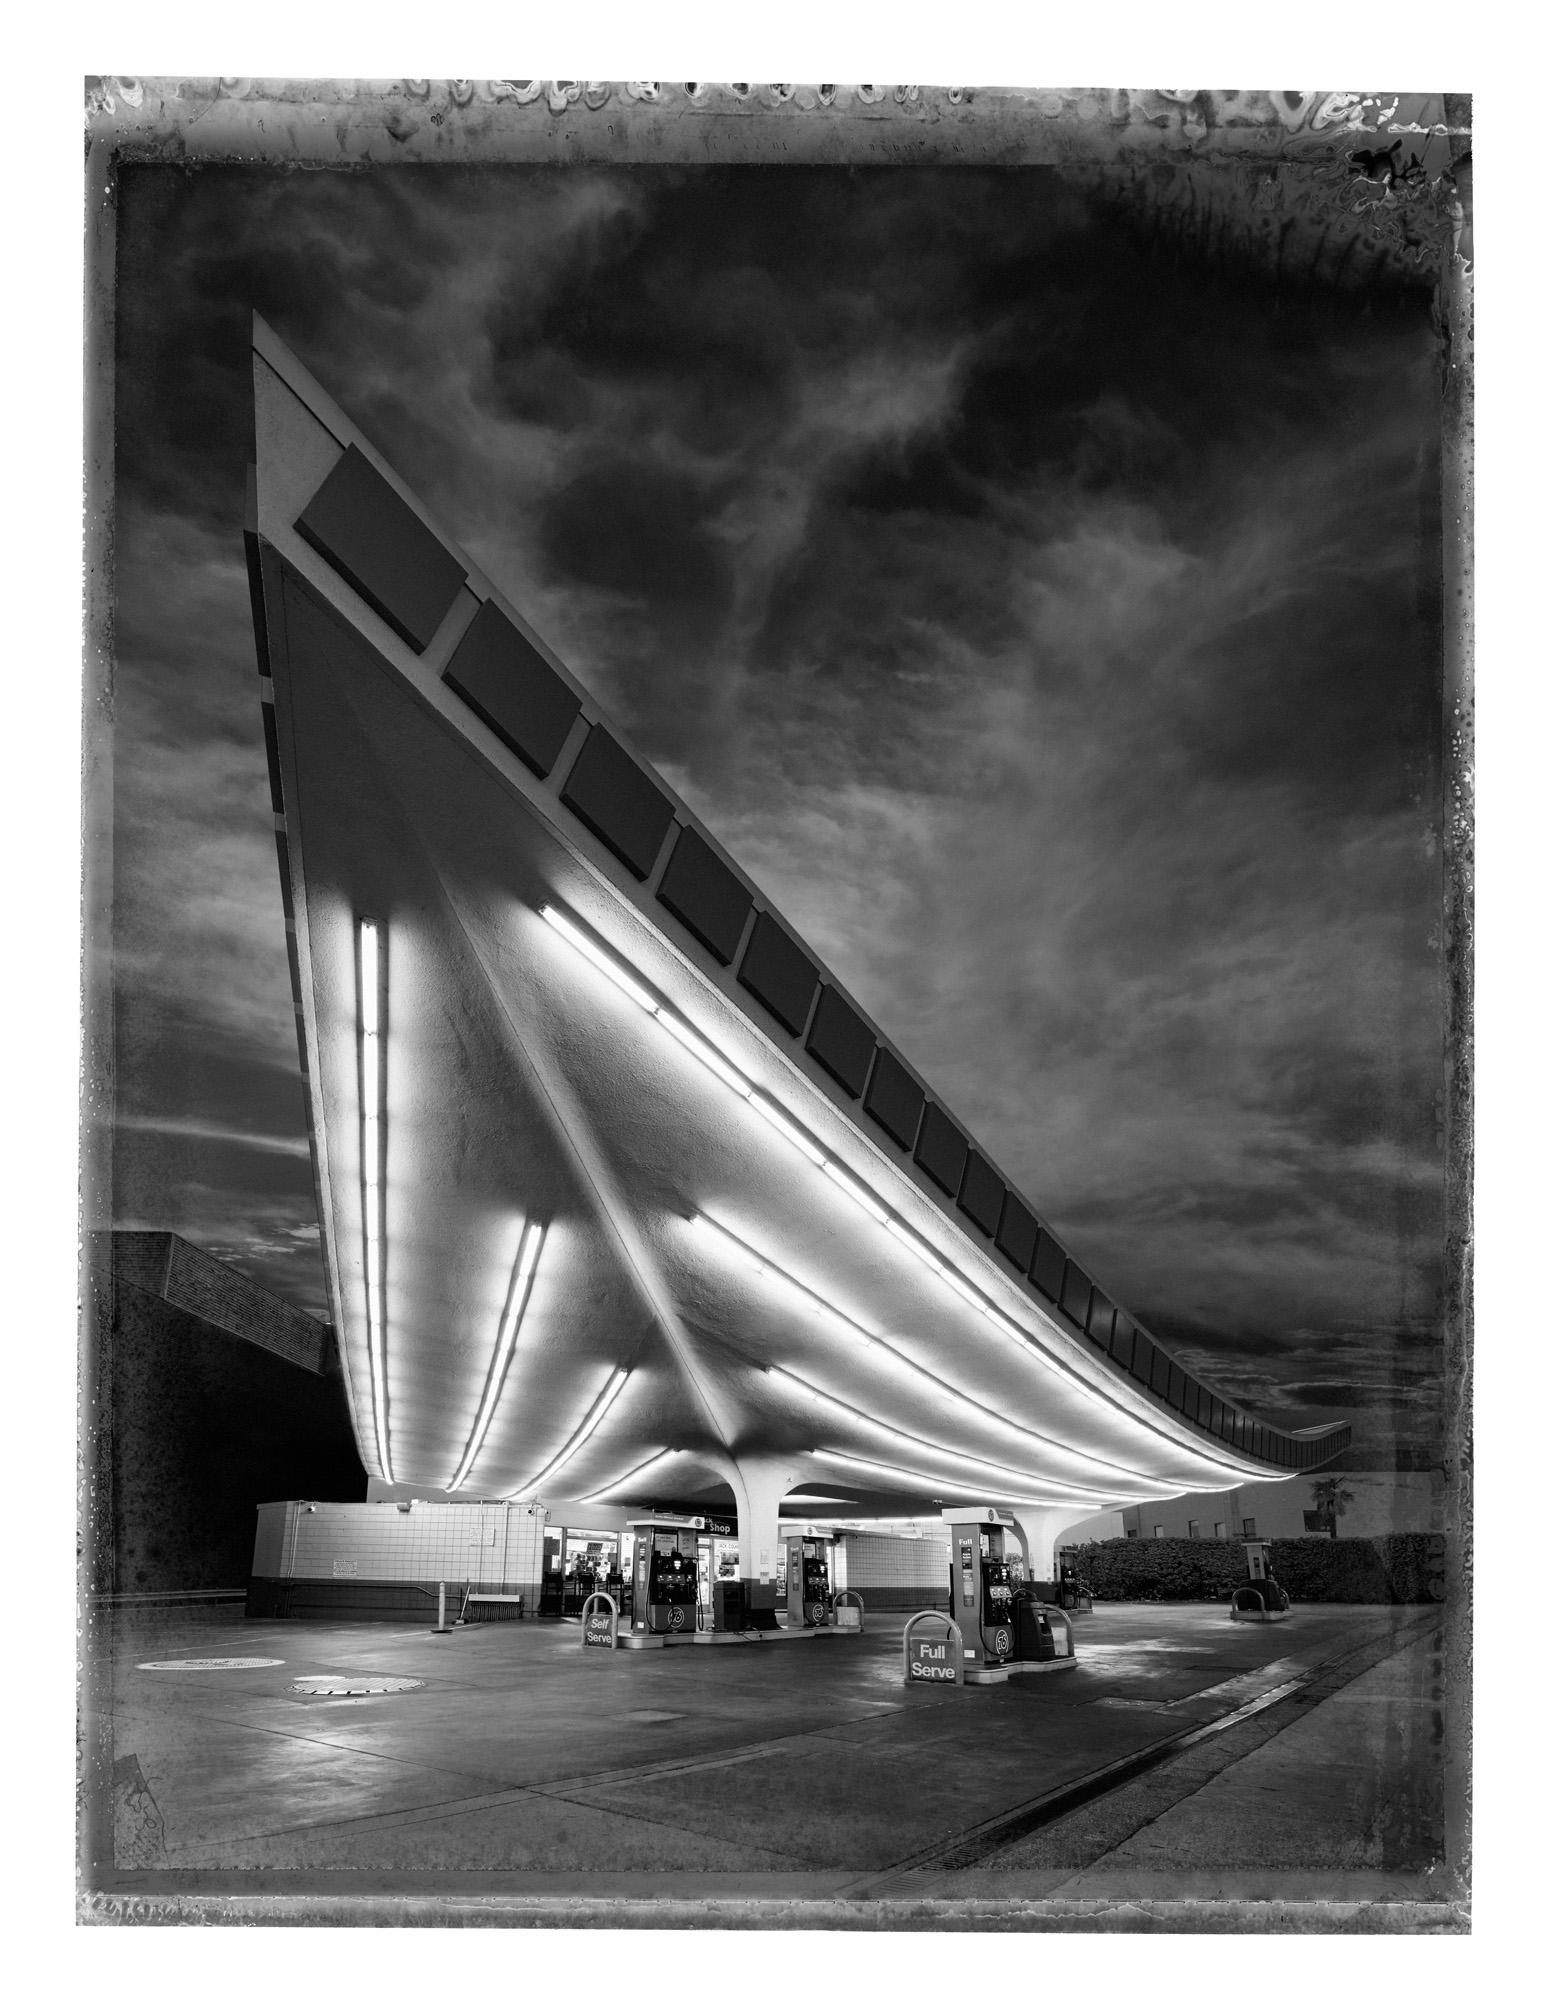 00_Frontpiece_Union_Gas_Station.jpg